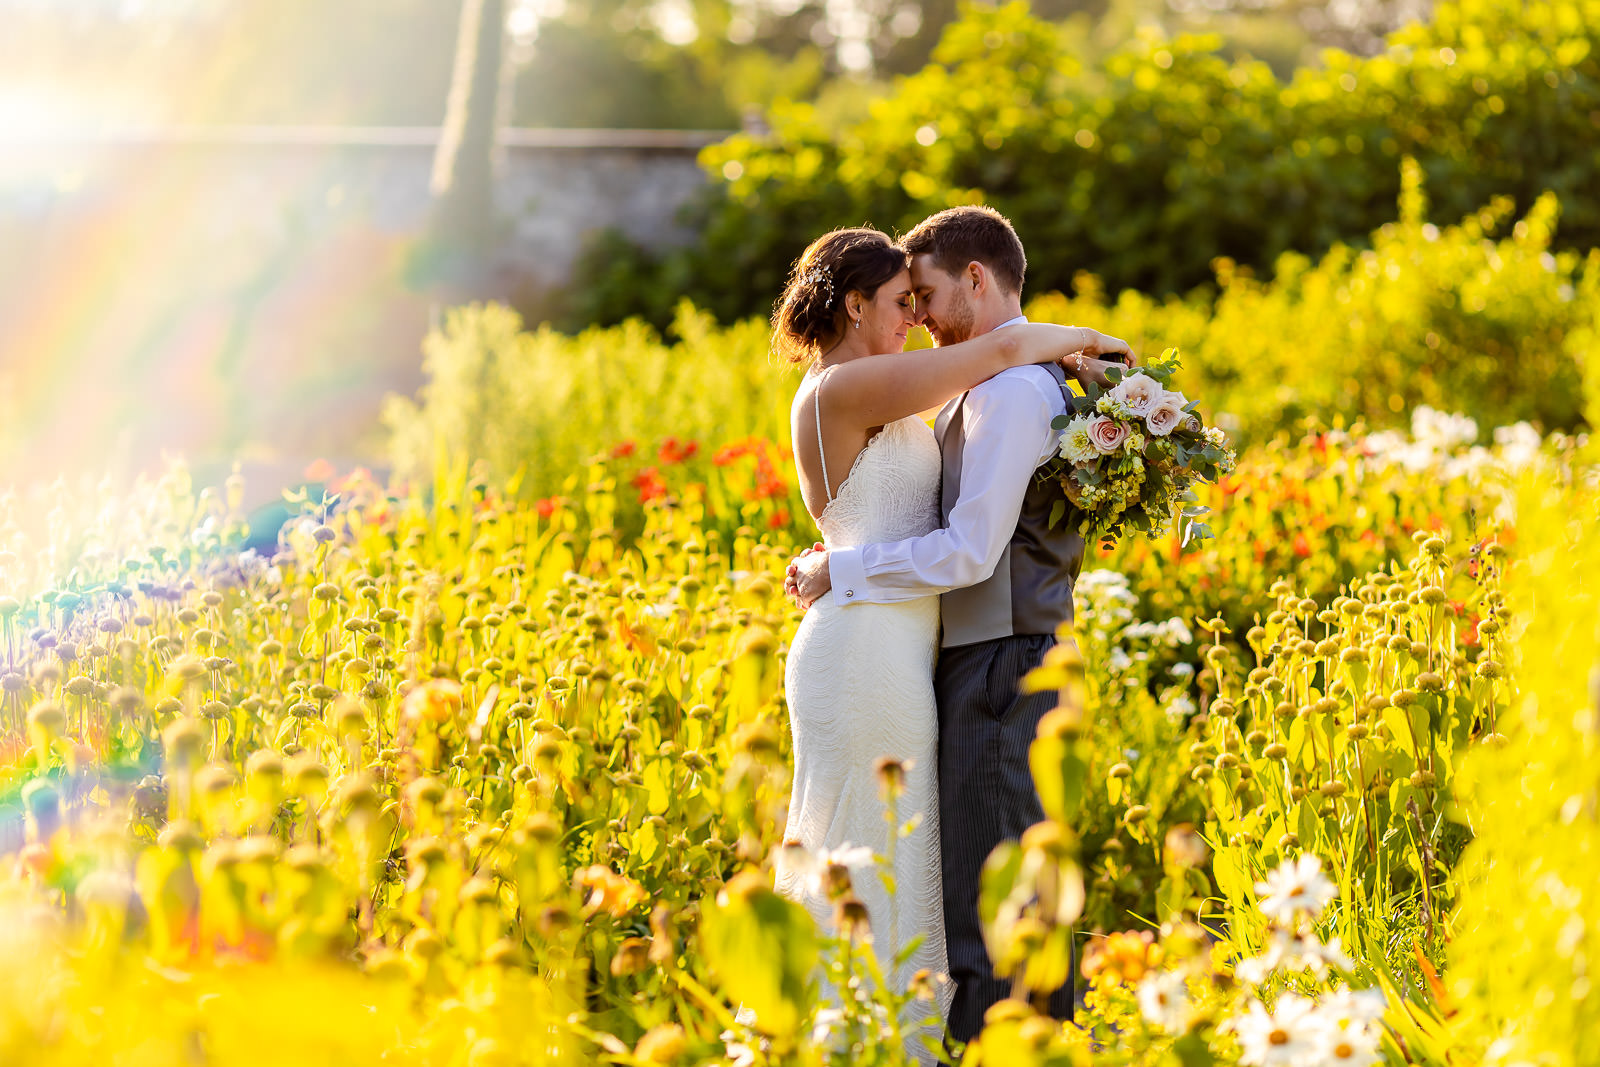 Fonmon Castle Wedding - Bride and Groom in flower garden - Cardiff Wedding Photographer